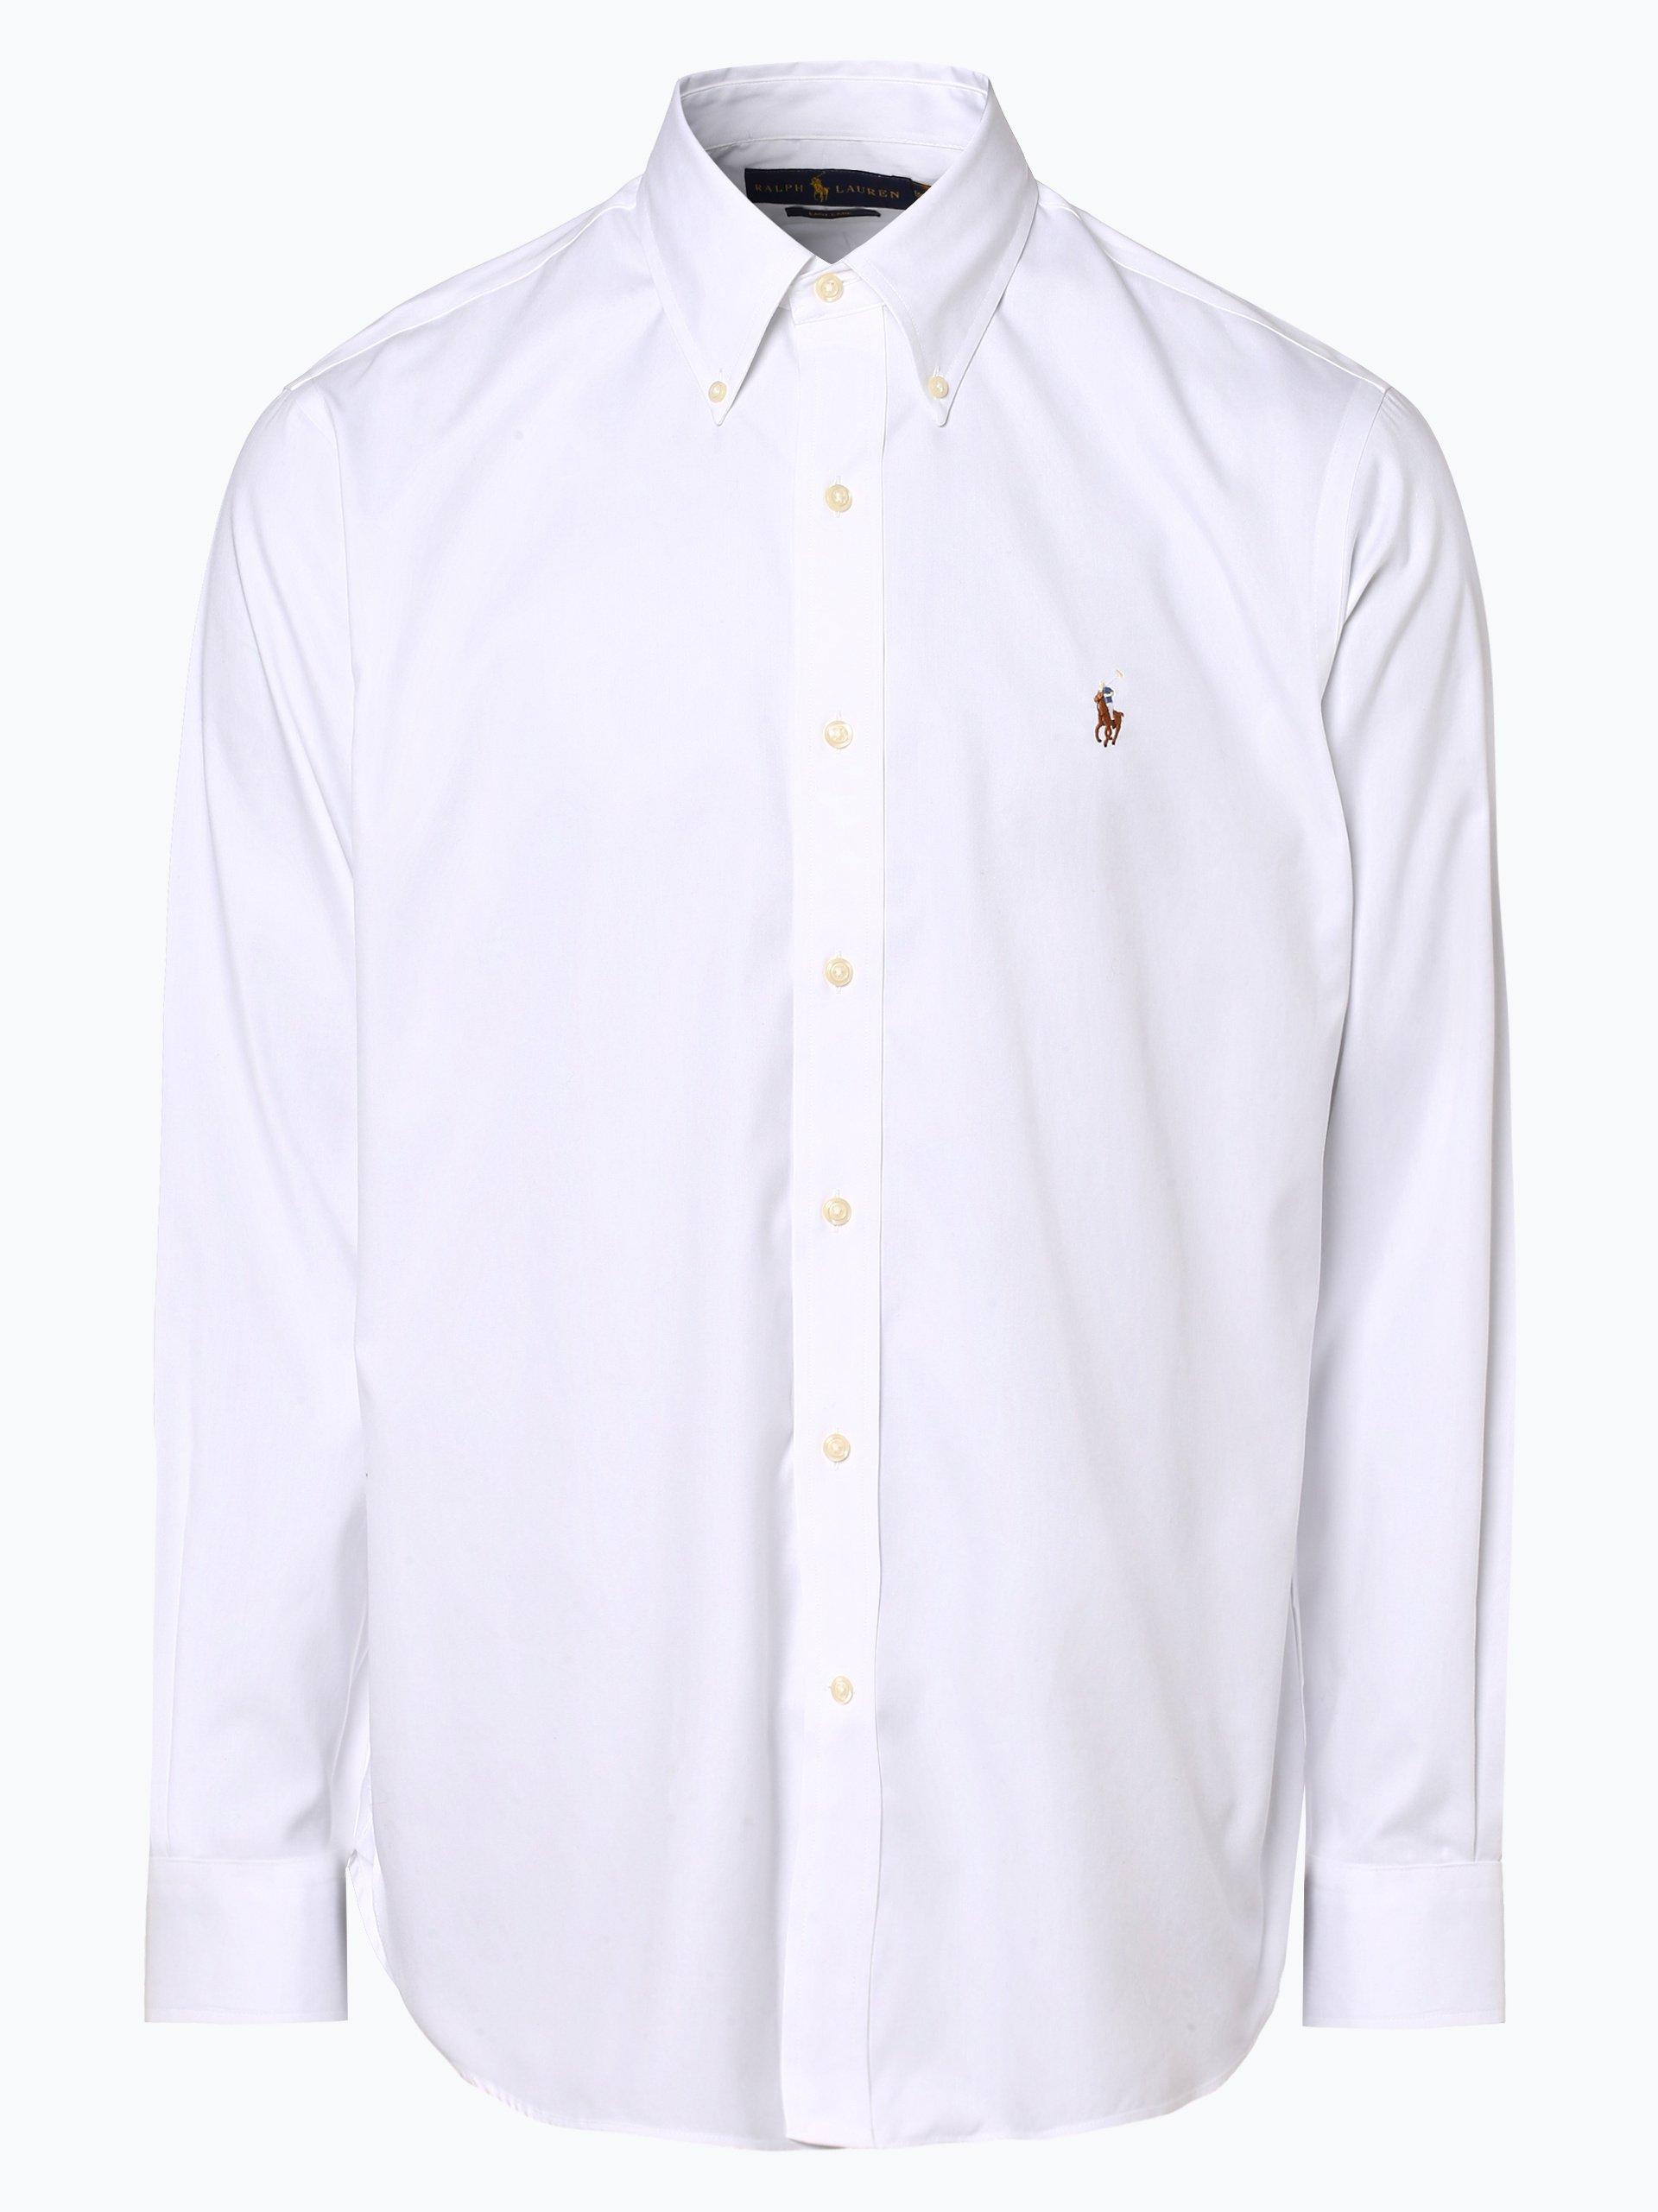 Polo Ralph Lauren Herren Hemd - Bügelleicht